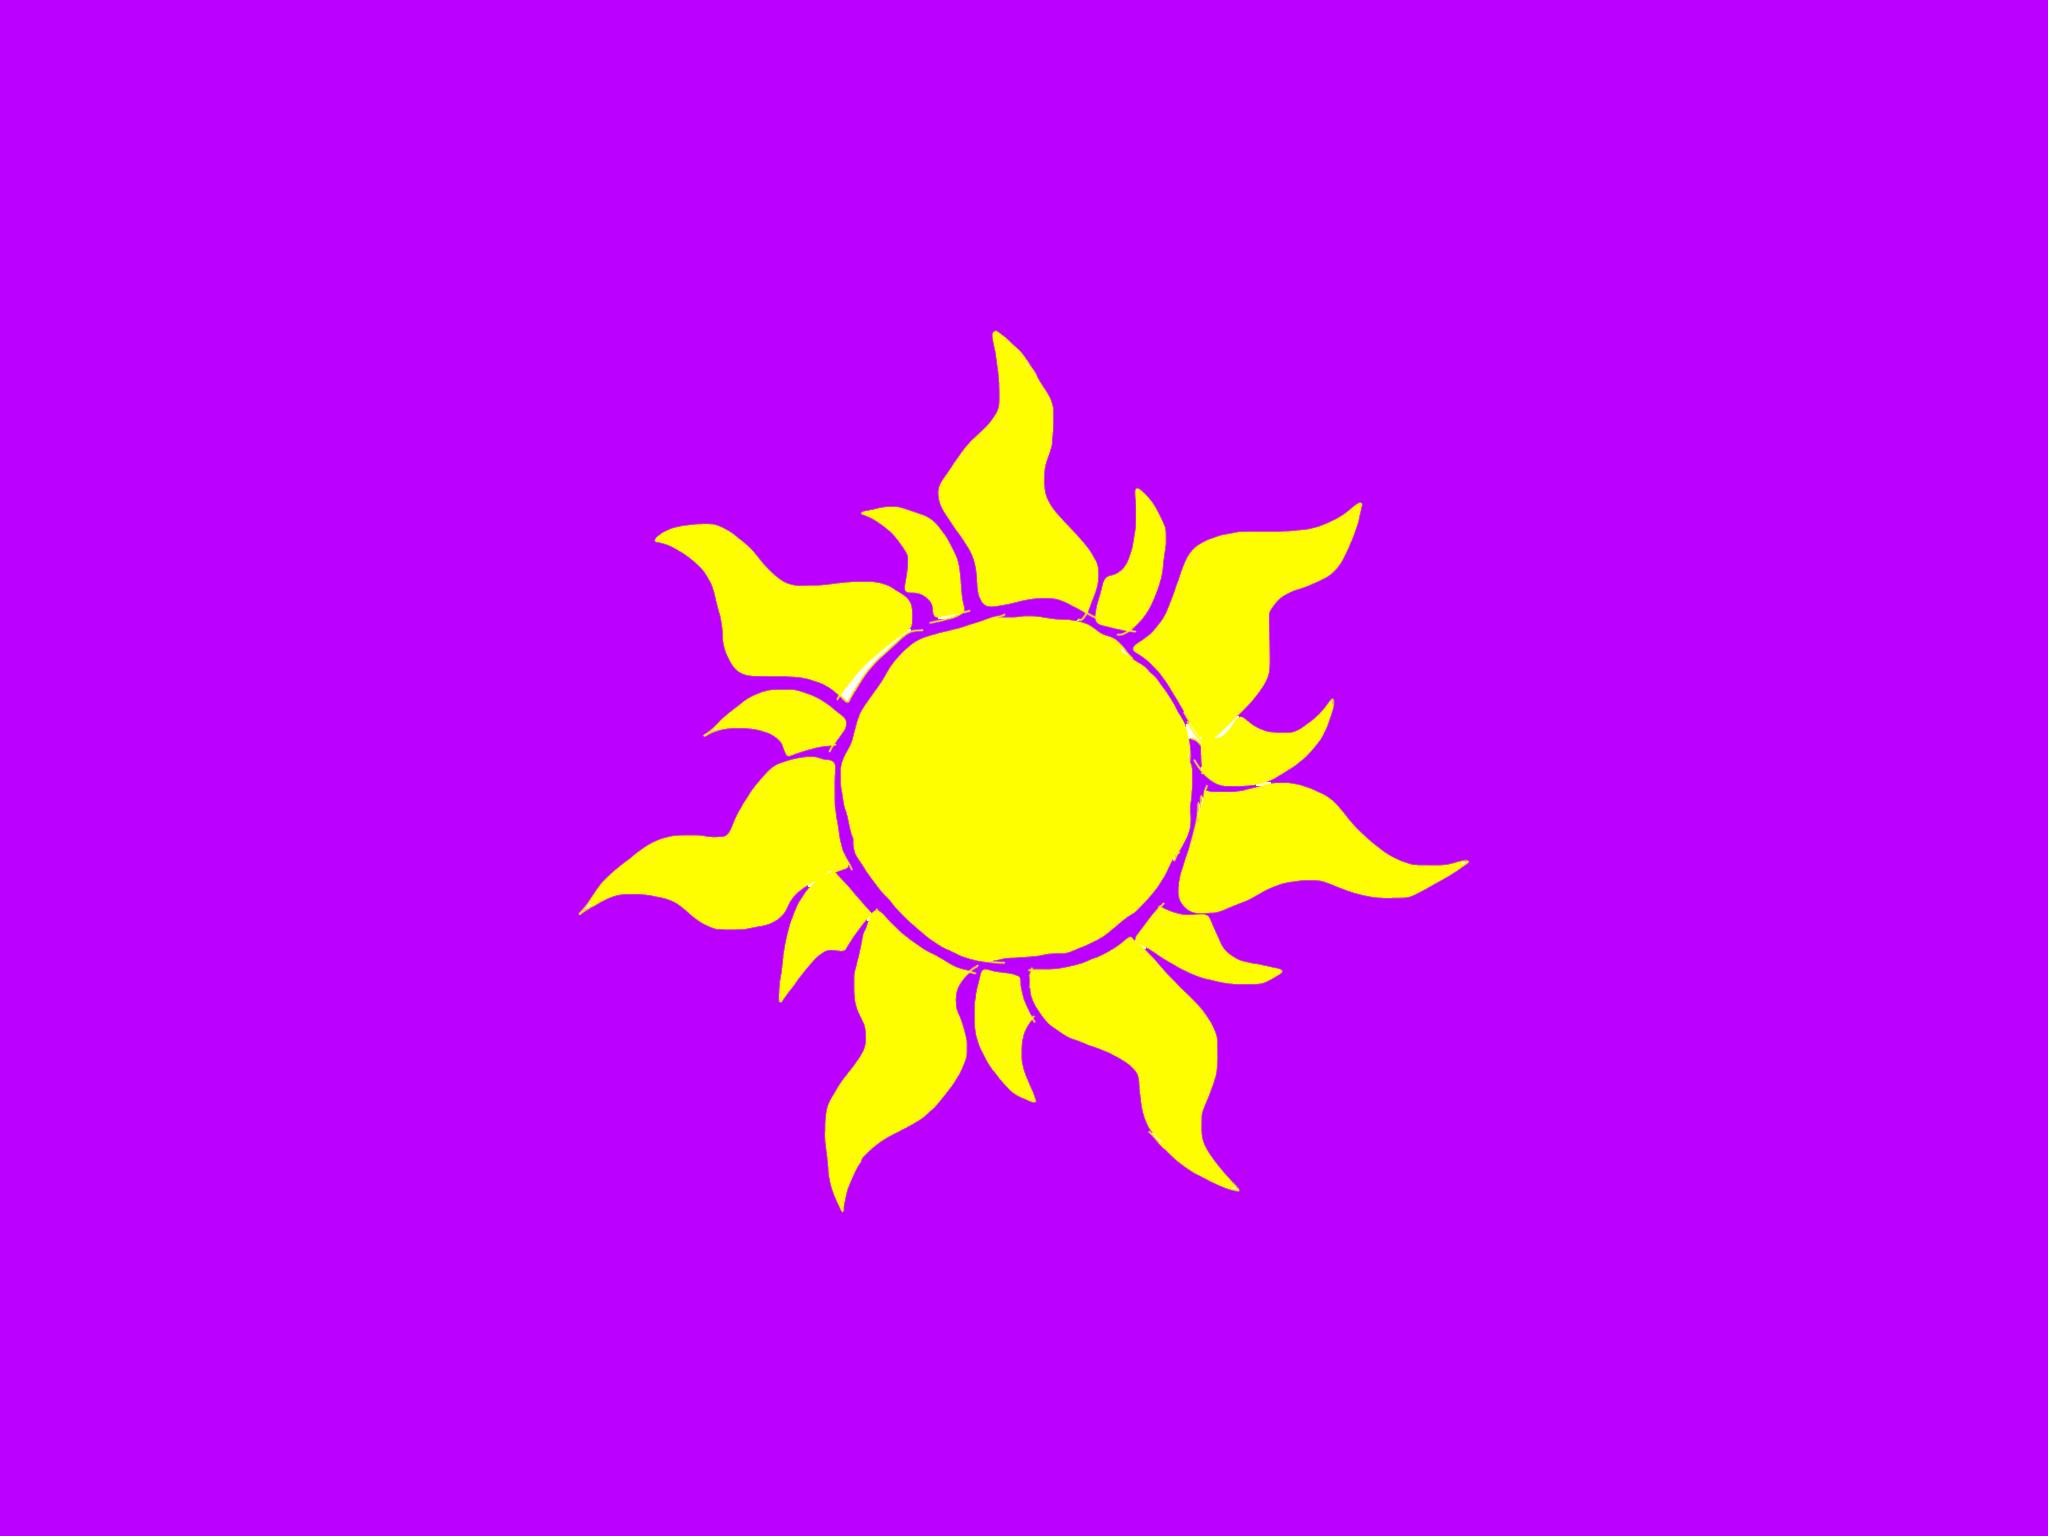 Tangled sun symbol images symbol and sign ideas disney princess symbols by helloddgirl on deviantart tangled flower sun thing by helloddgirl buycottarizona buycottarizona